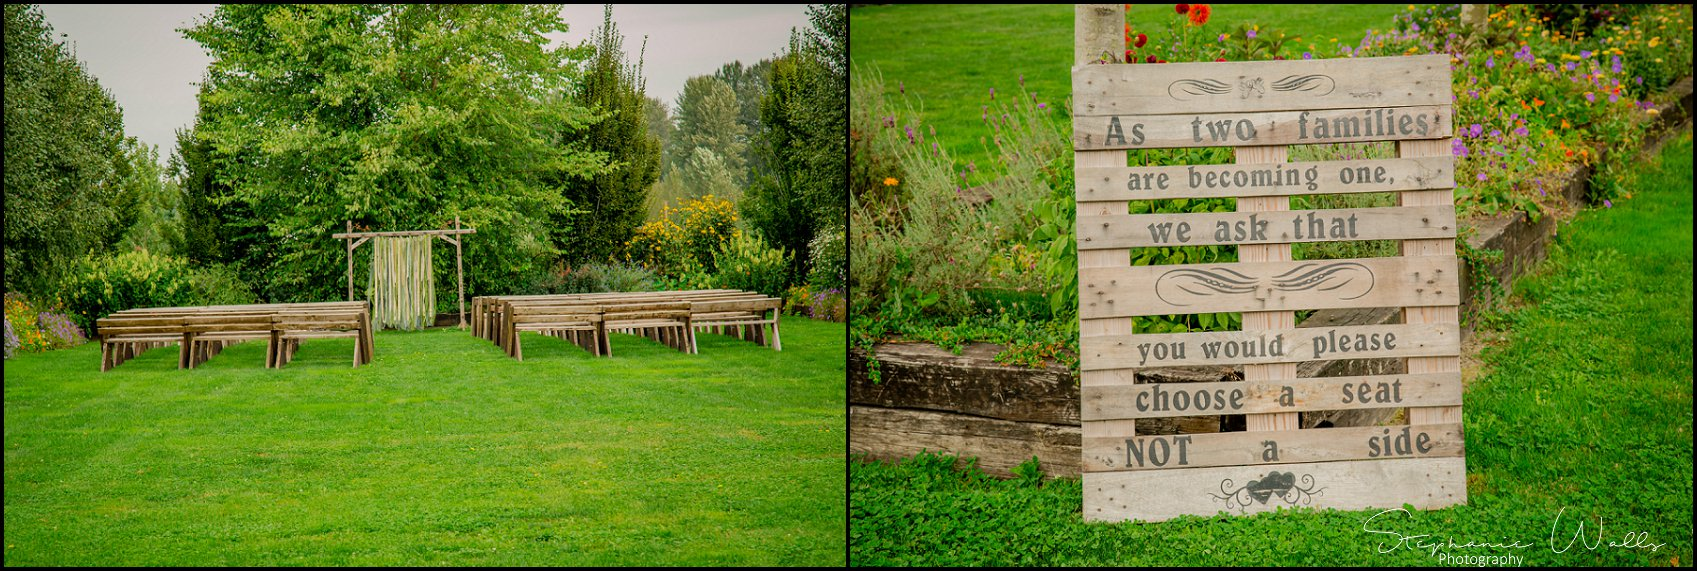 Kimble Wedding 038 Marlena & Allans | Snohomish Red Barn Events (Stocker Farms) | Snohomish, Wa Wedding Photographer